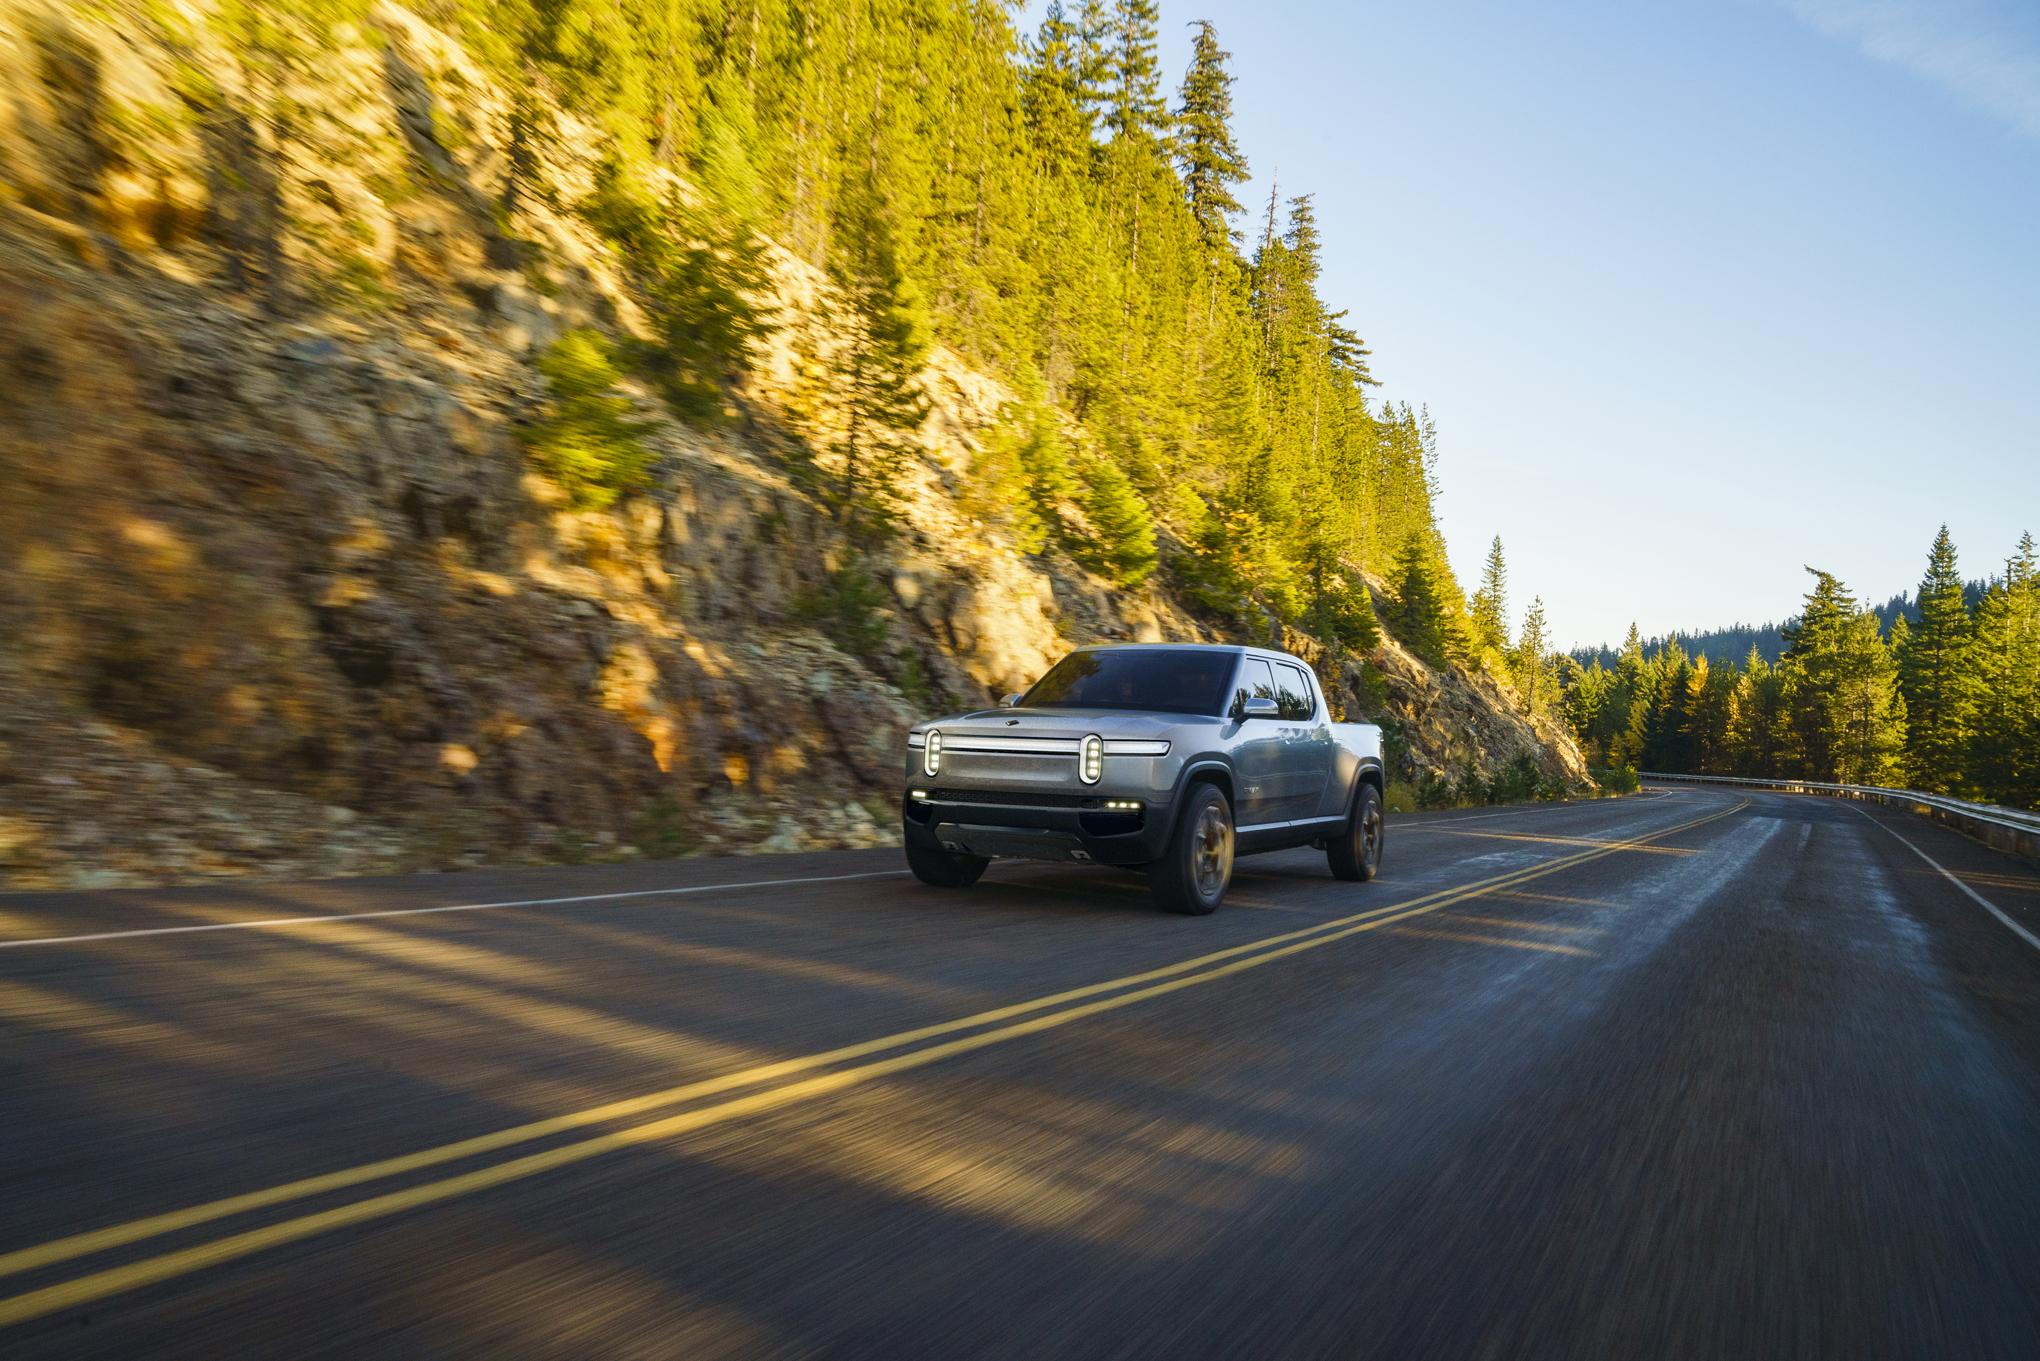 Rivian announces RT1 pickup truck: $69k price, 400+ mile